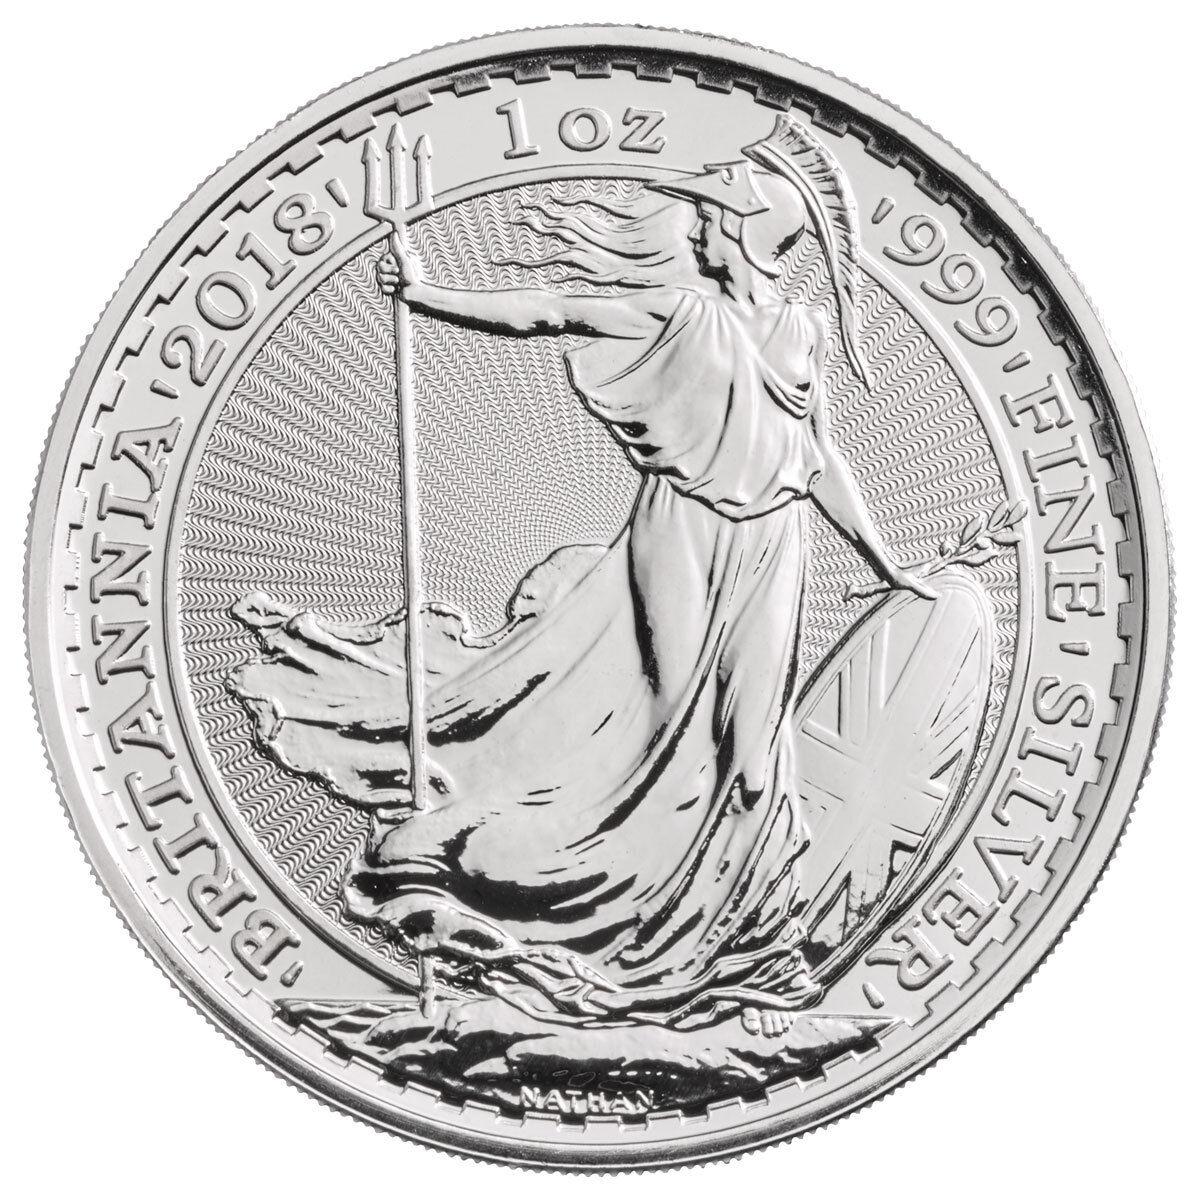 Купить 2018 Great Britain 1 oz Silver Britannia £2 Coin GEM BU SKU49809